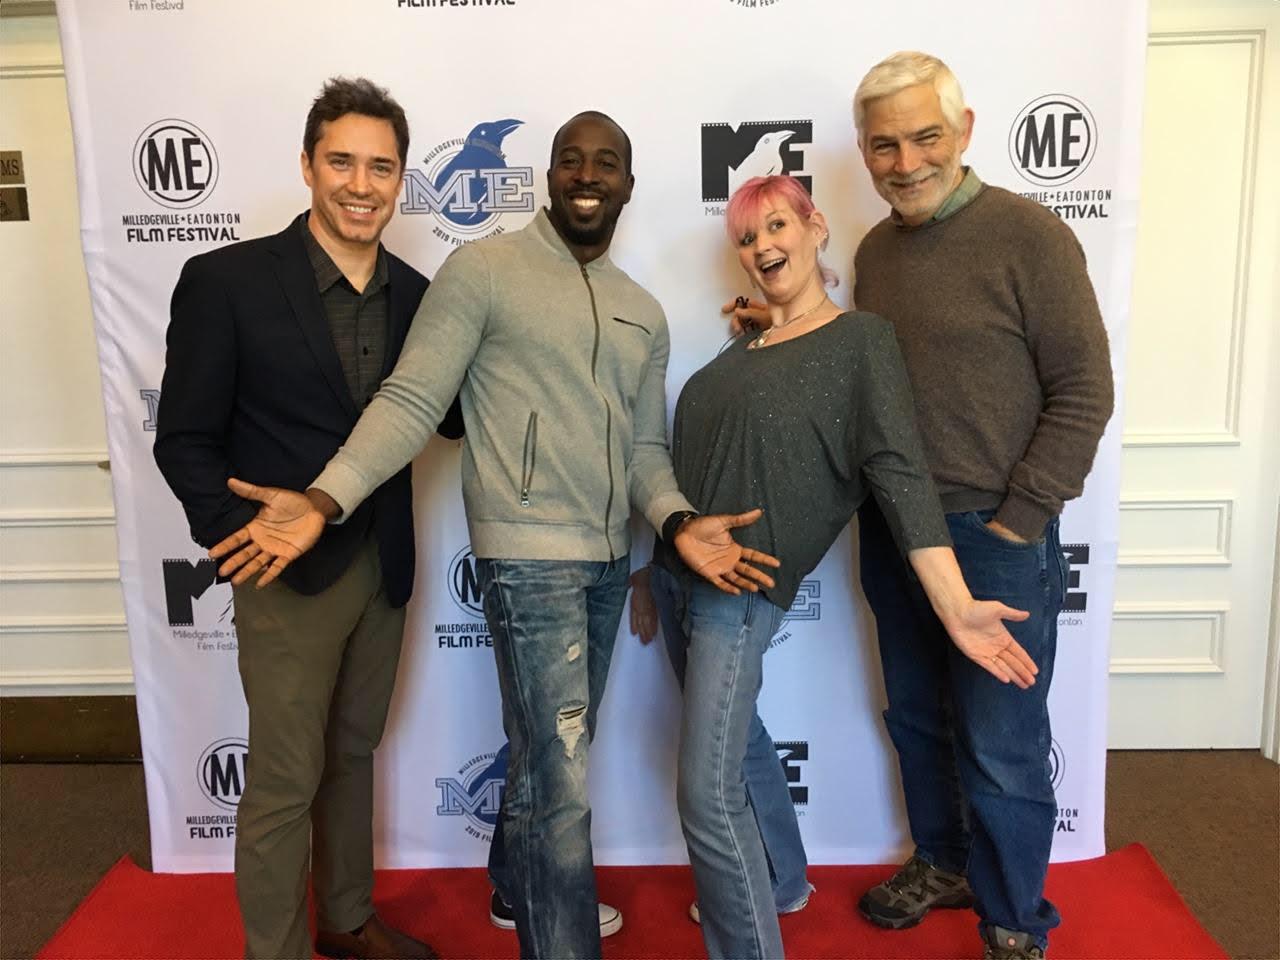 Milledgeville Film Festival Voiceover Panel